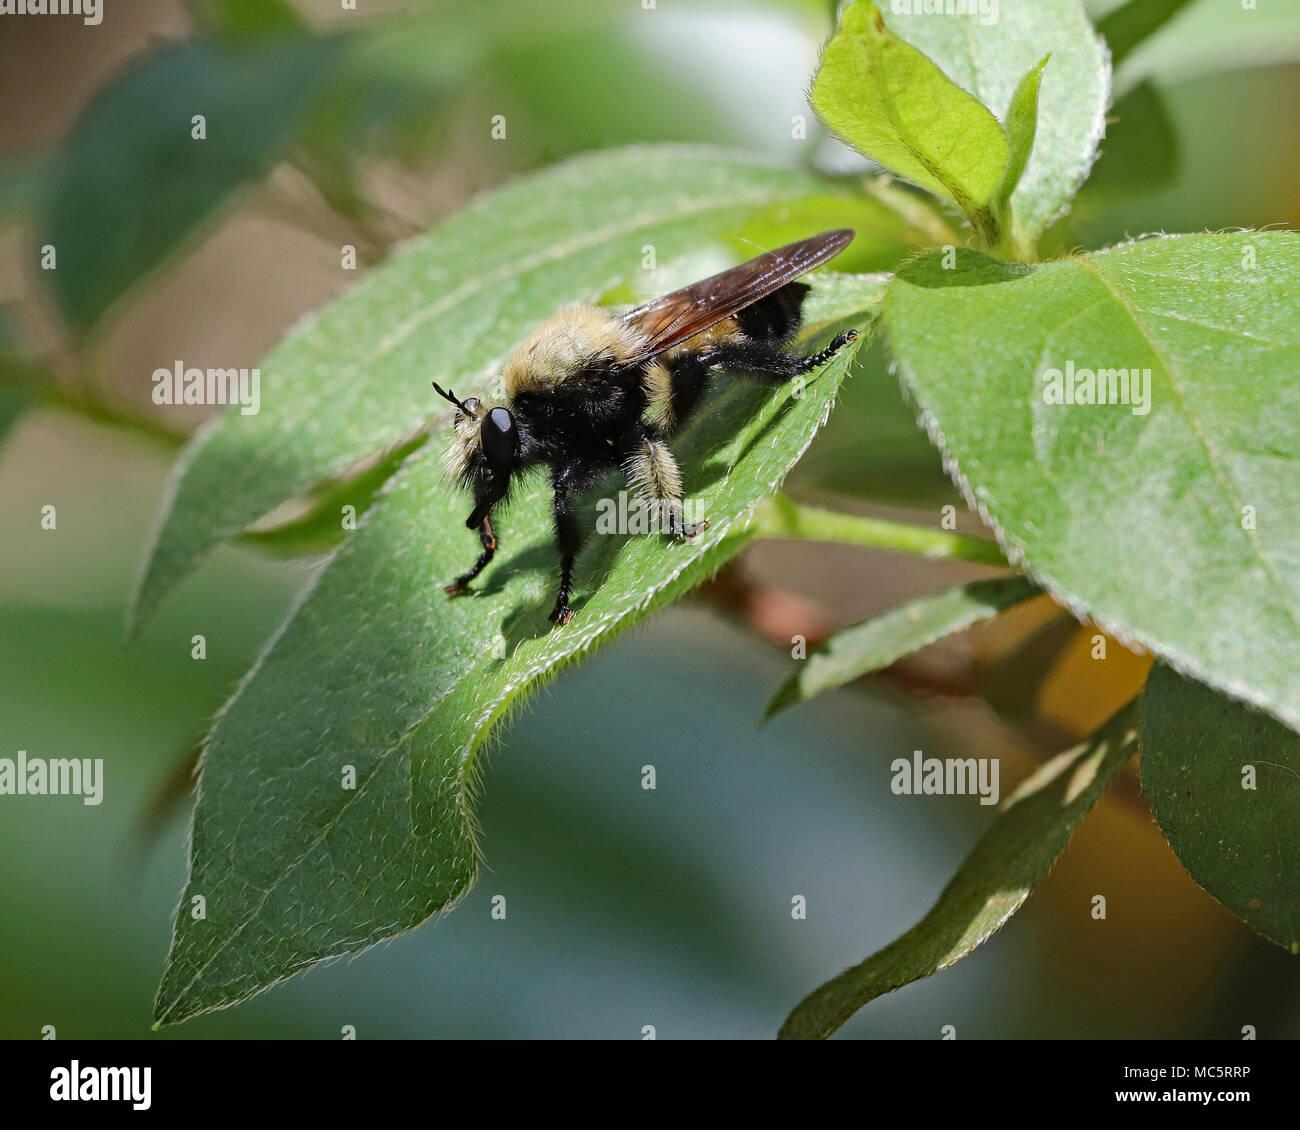 Florida Bee killer (Mallophora bomboides) macro - Stock Image